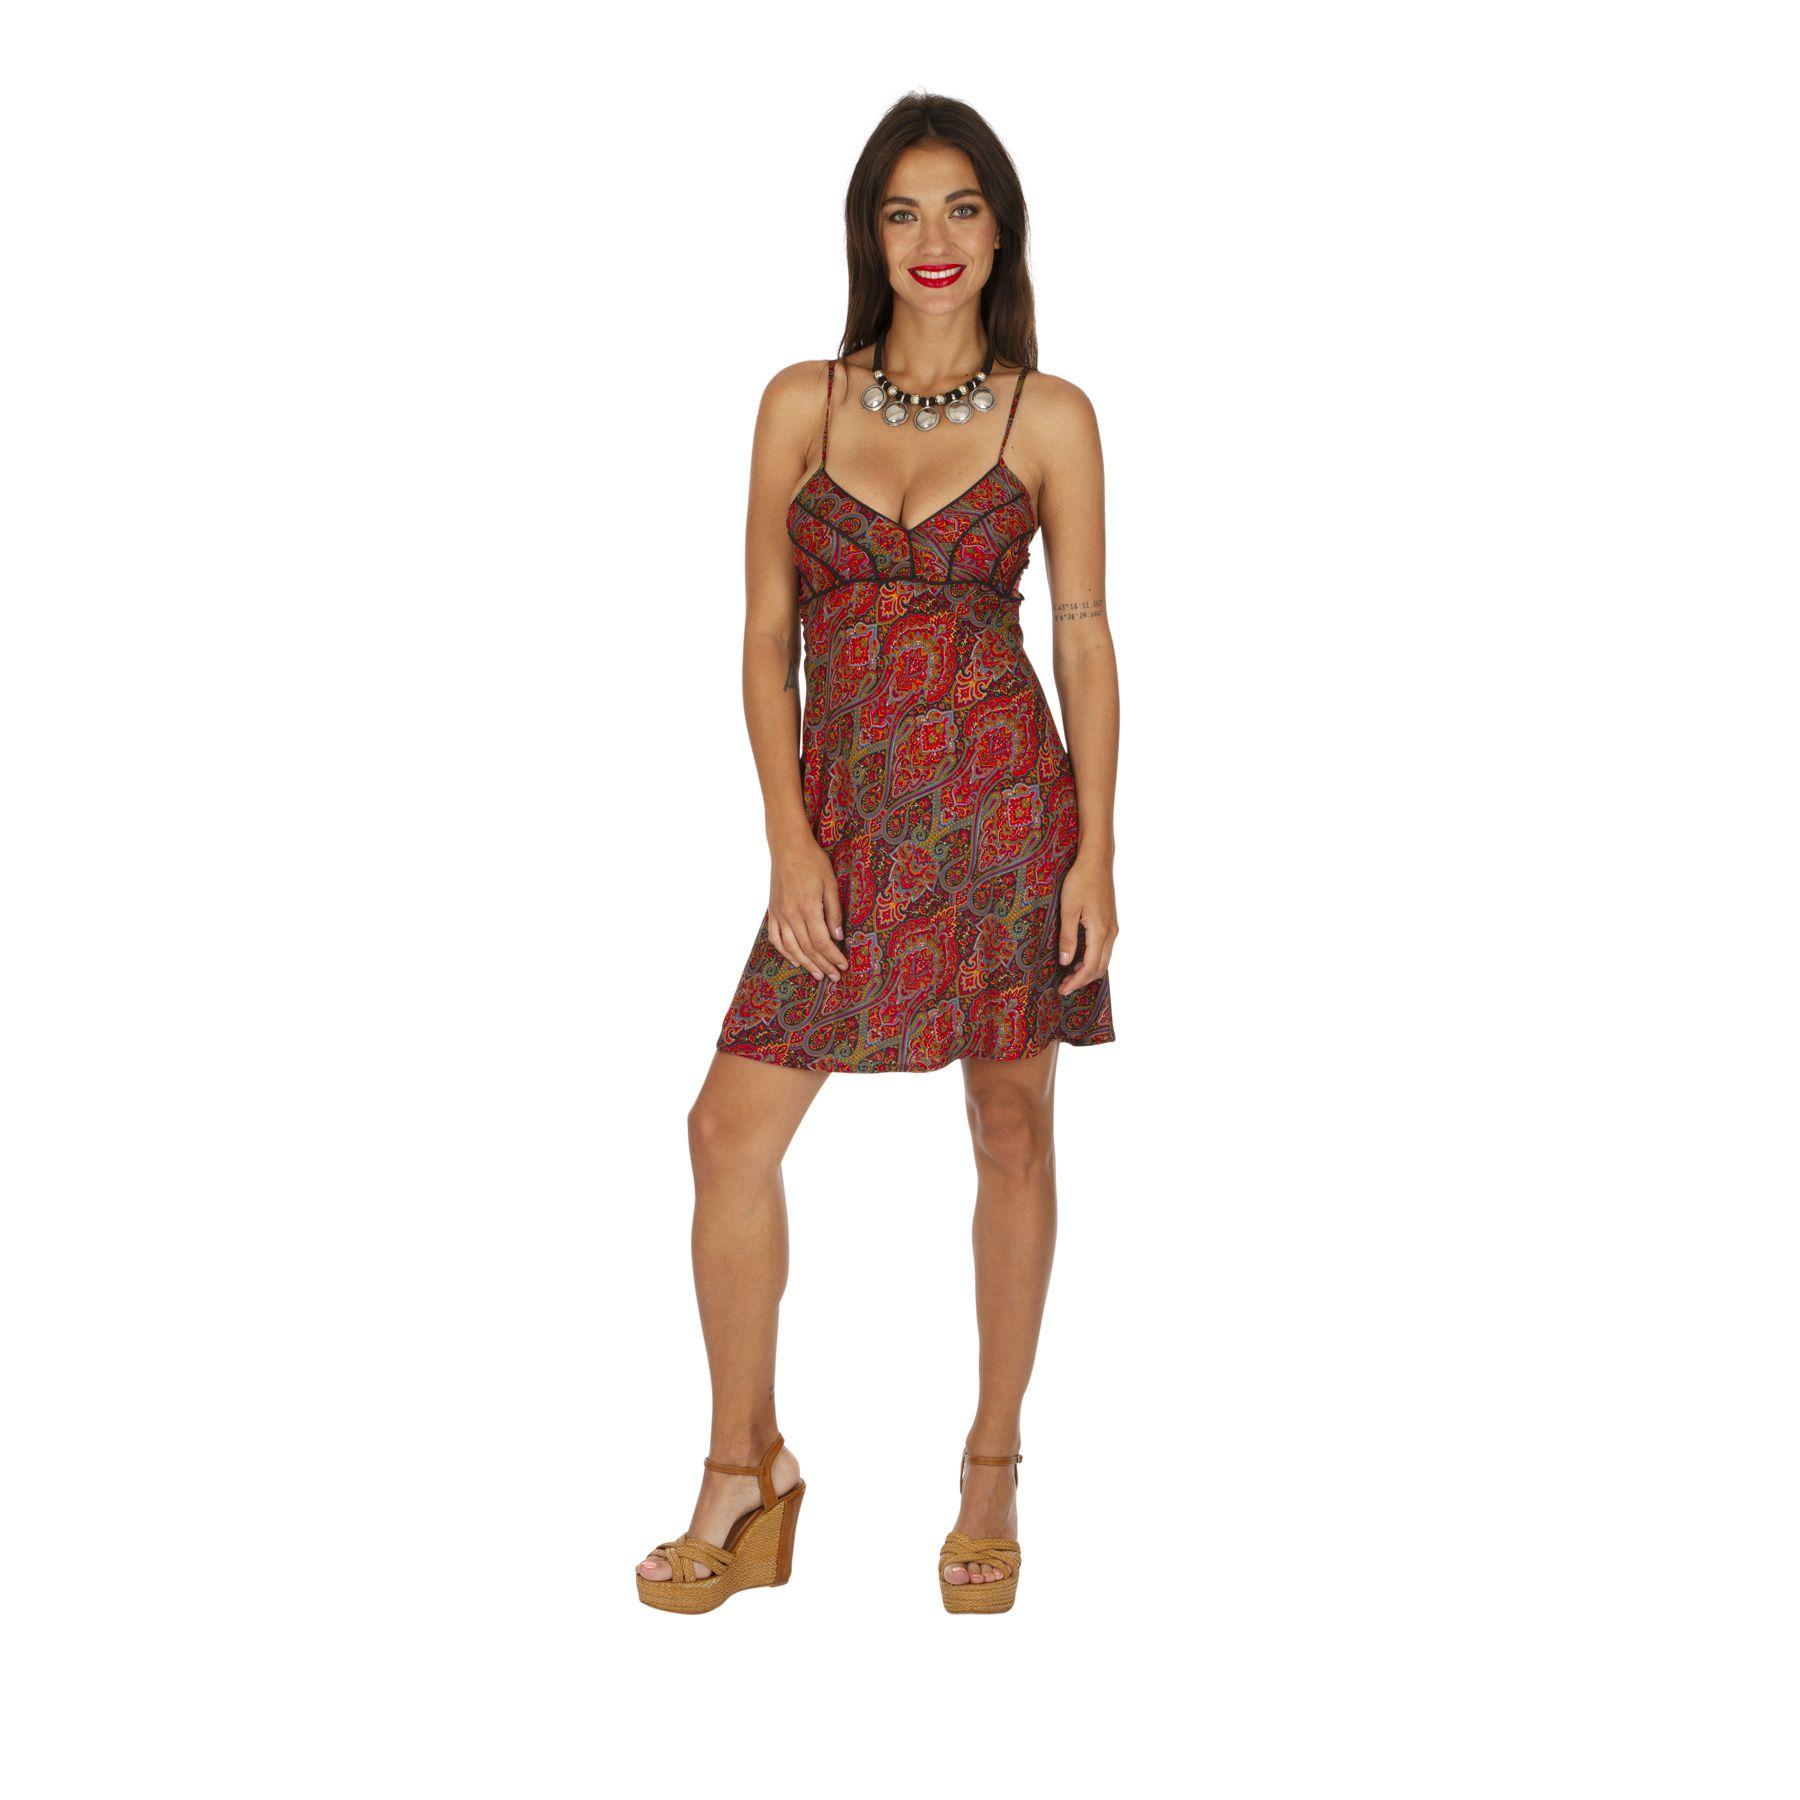 Robe caraco rouge et sexy robe de plage tendance été Sabrinay